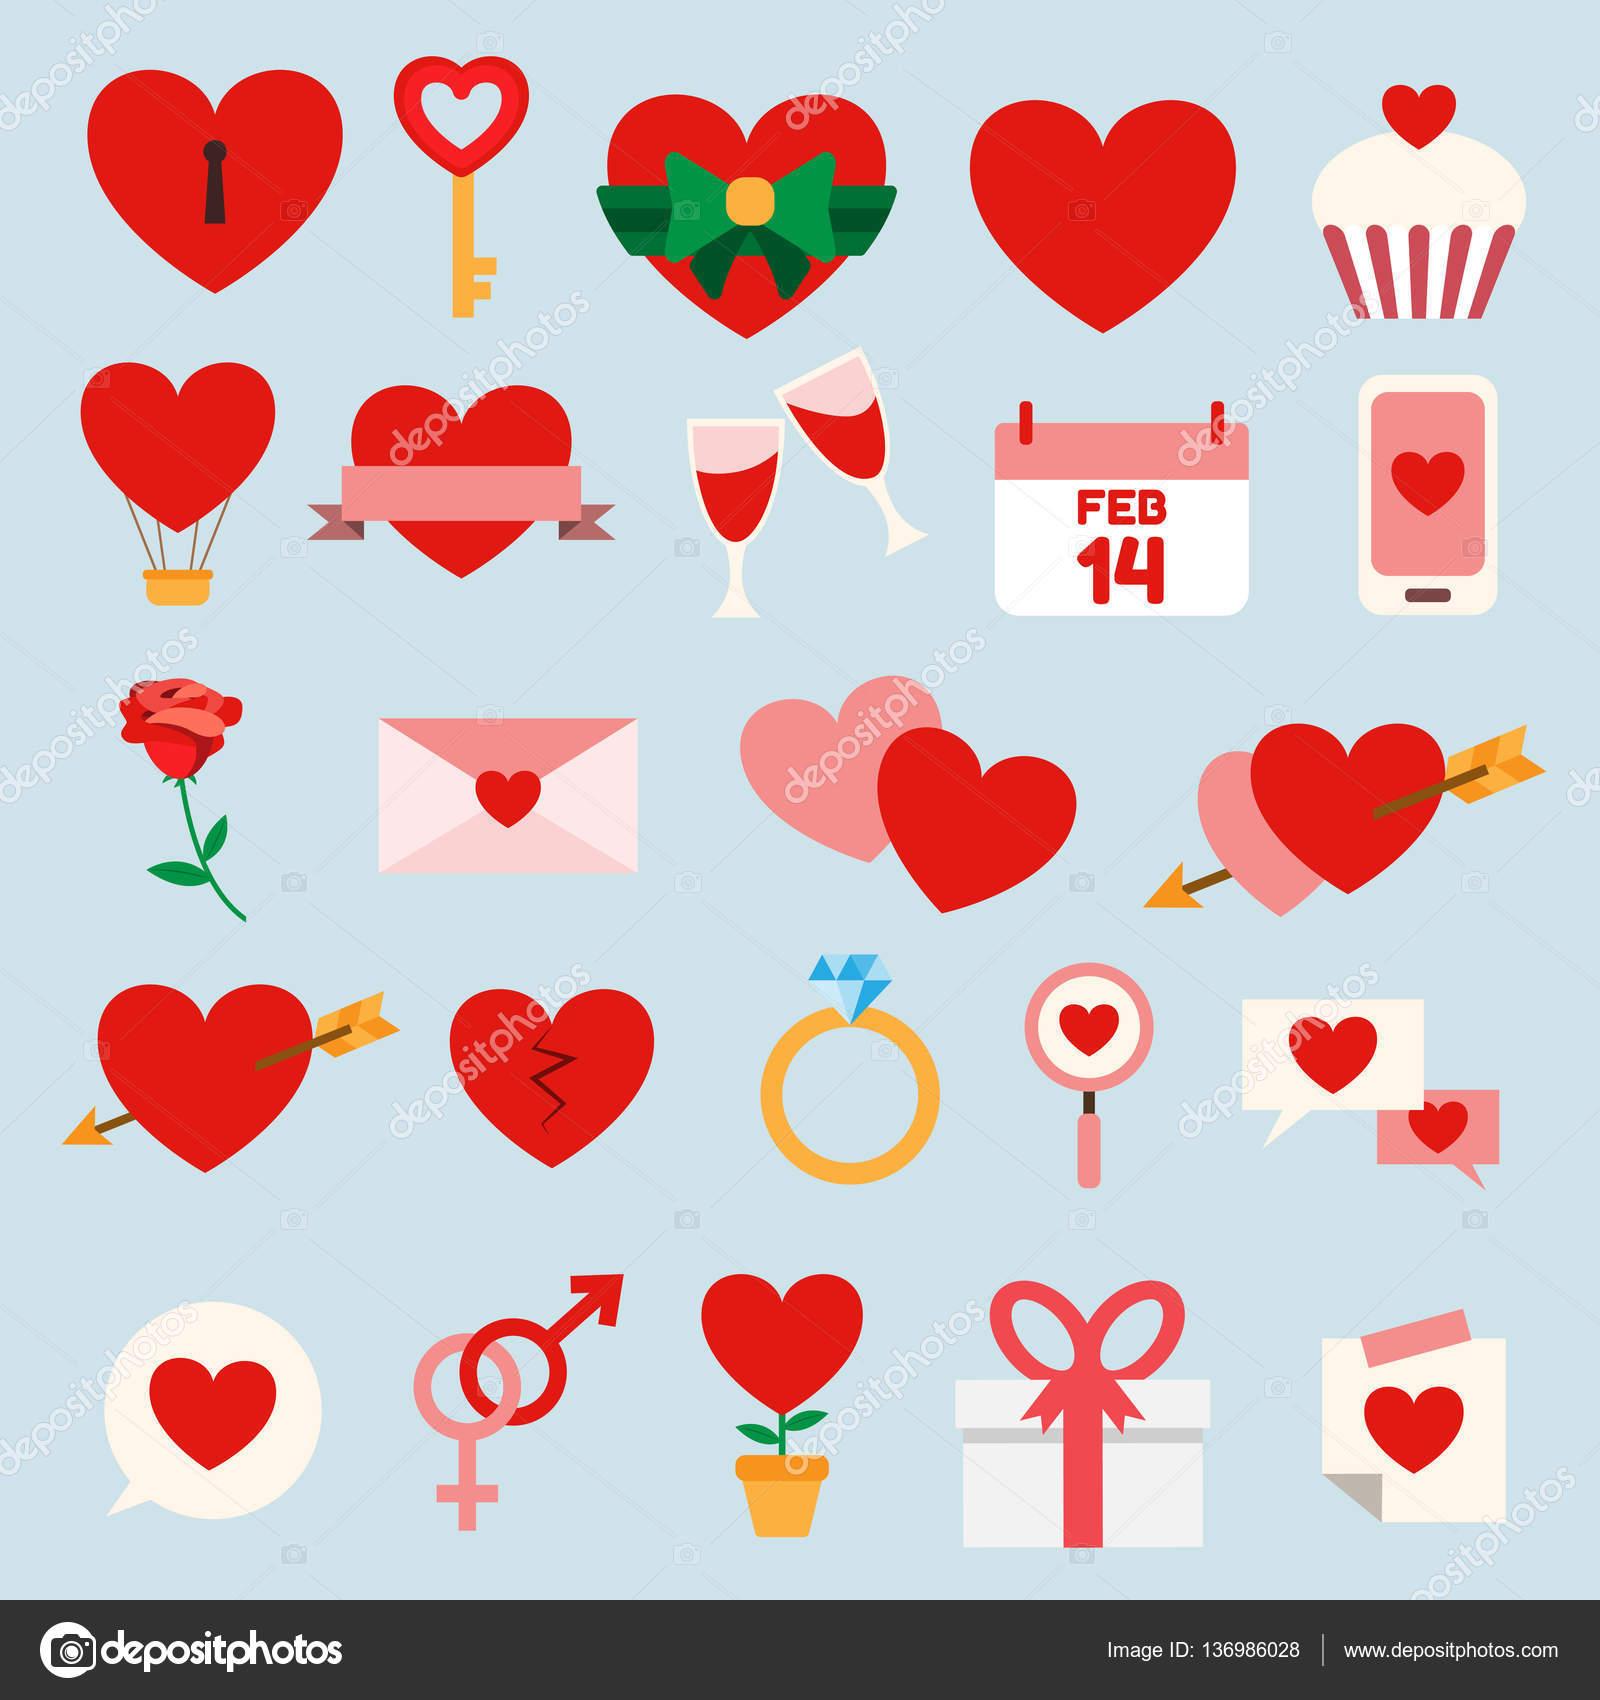 Dejting Valentine